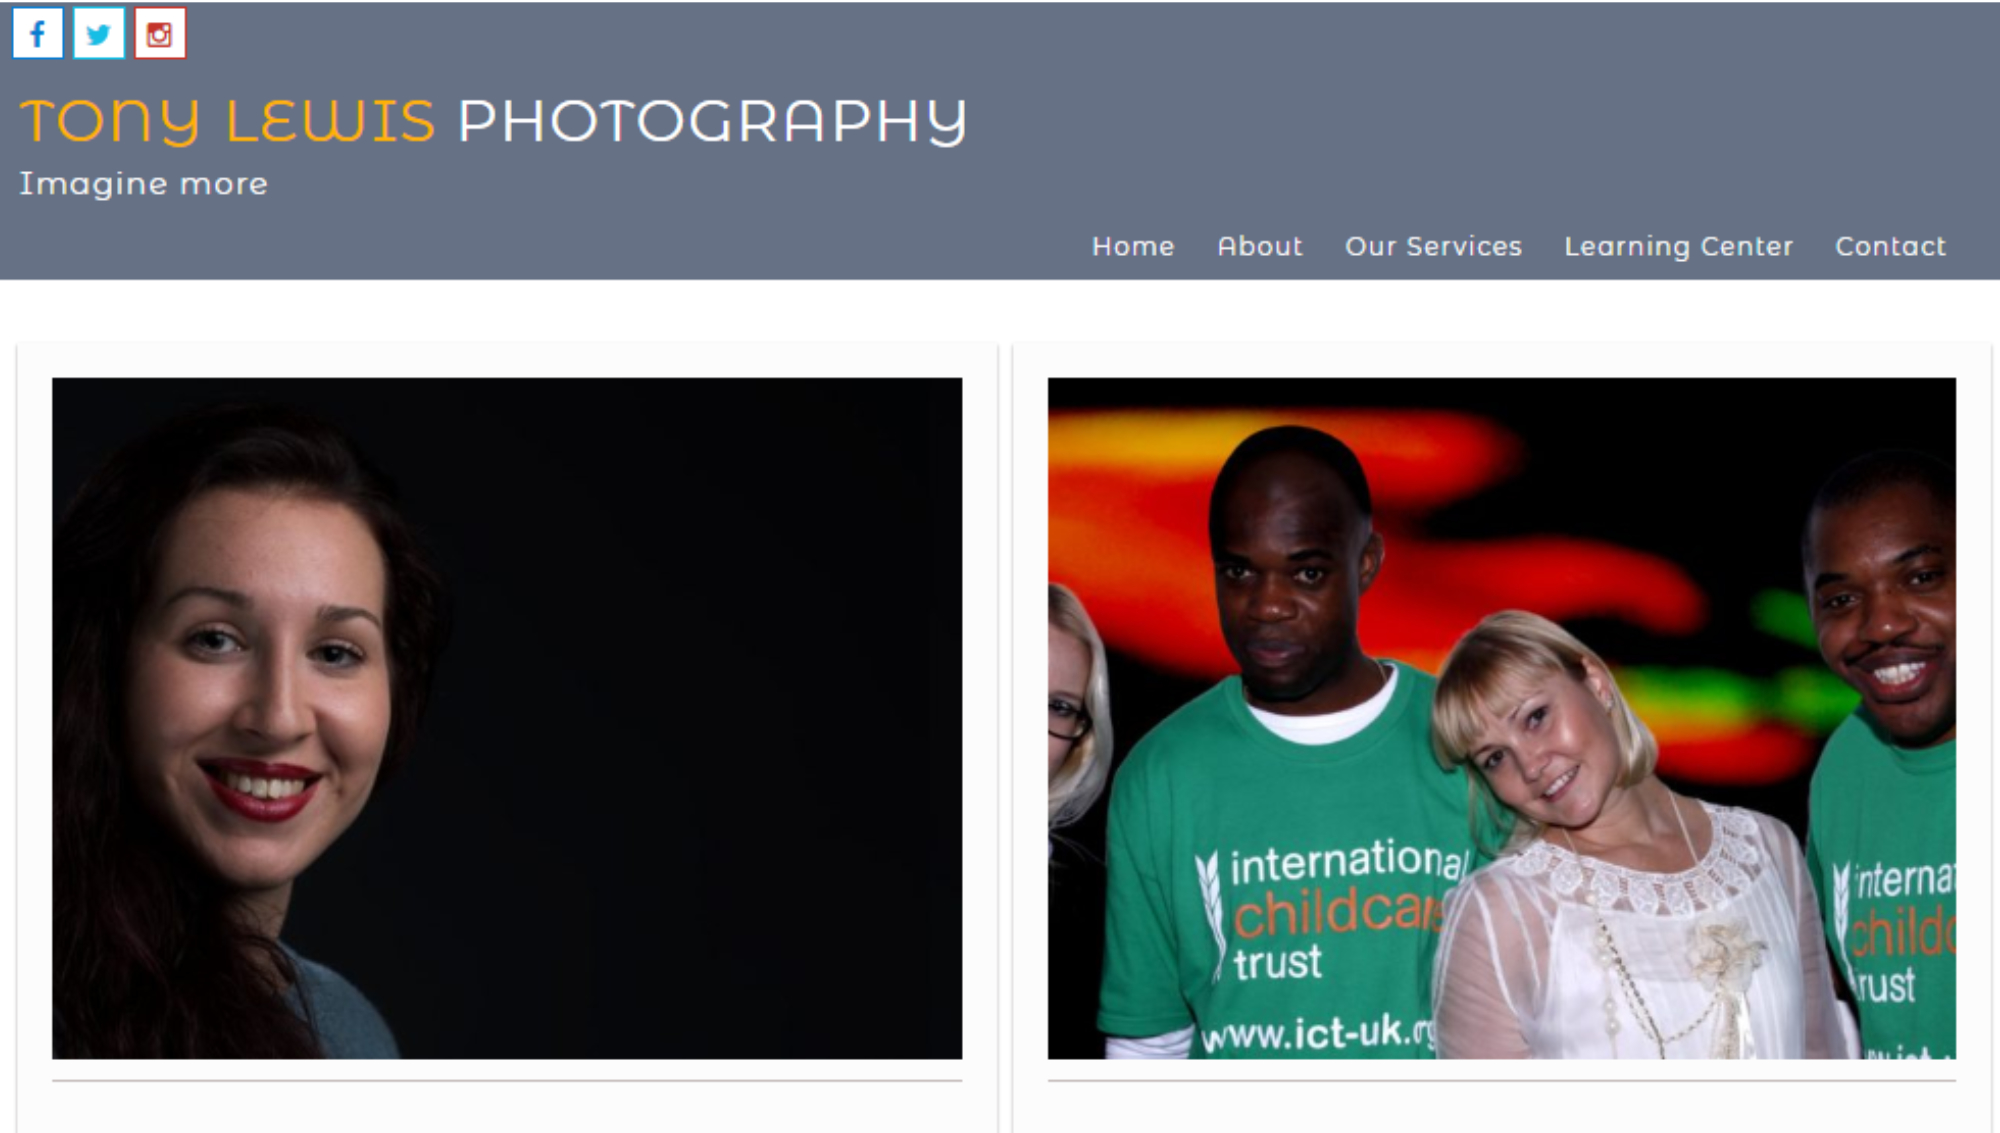 tonylewis-photography.co.uk